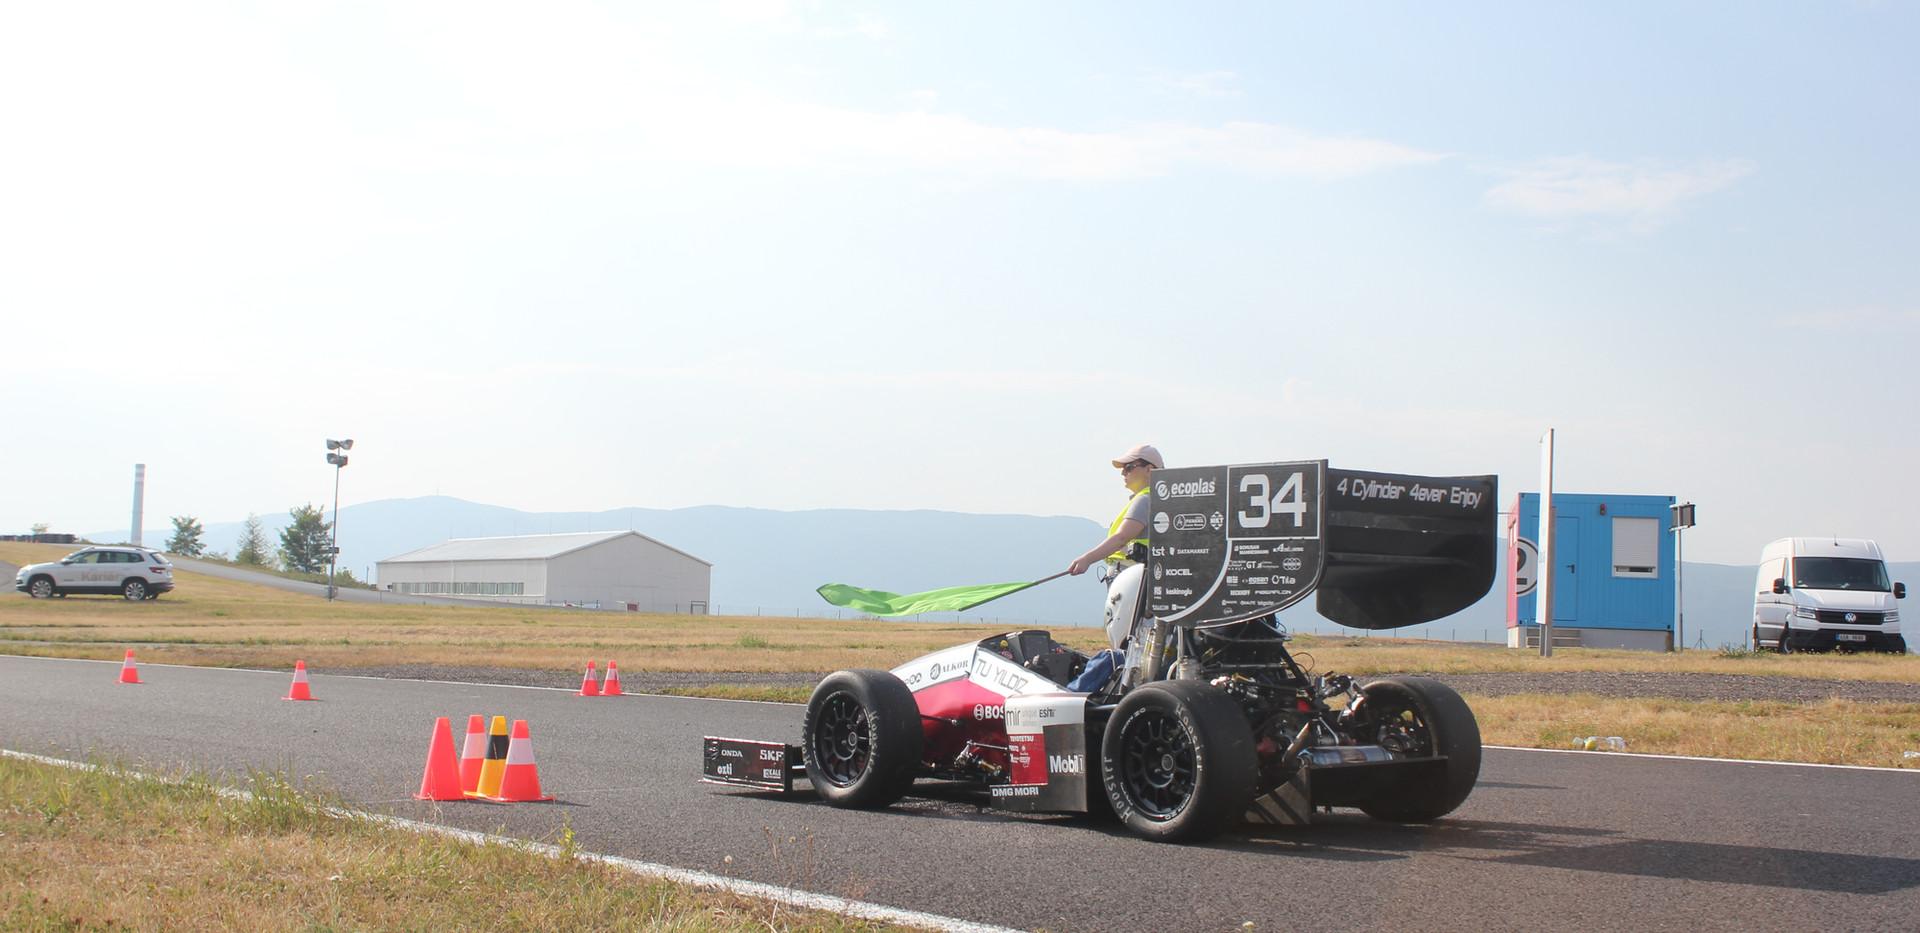 Varano de' Melegari Circuit / Italy